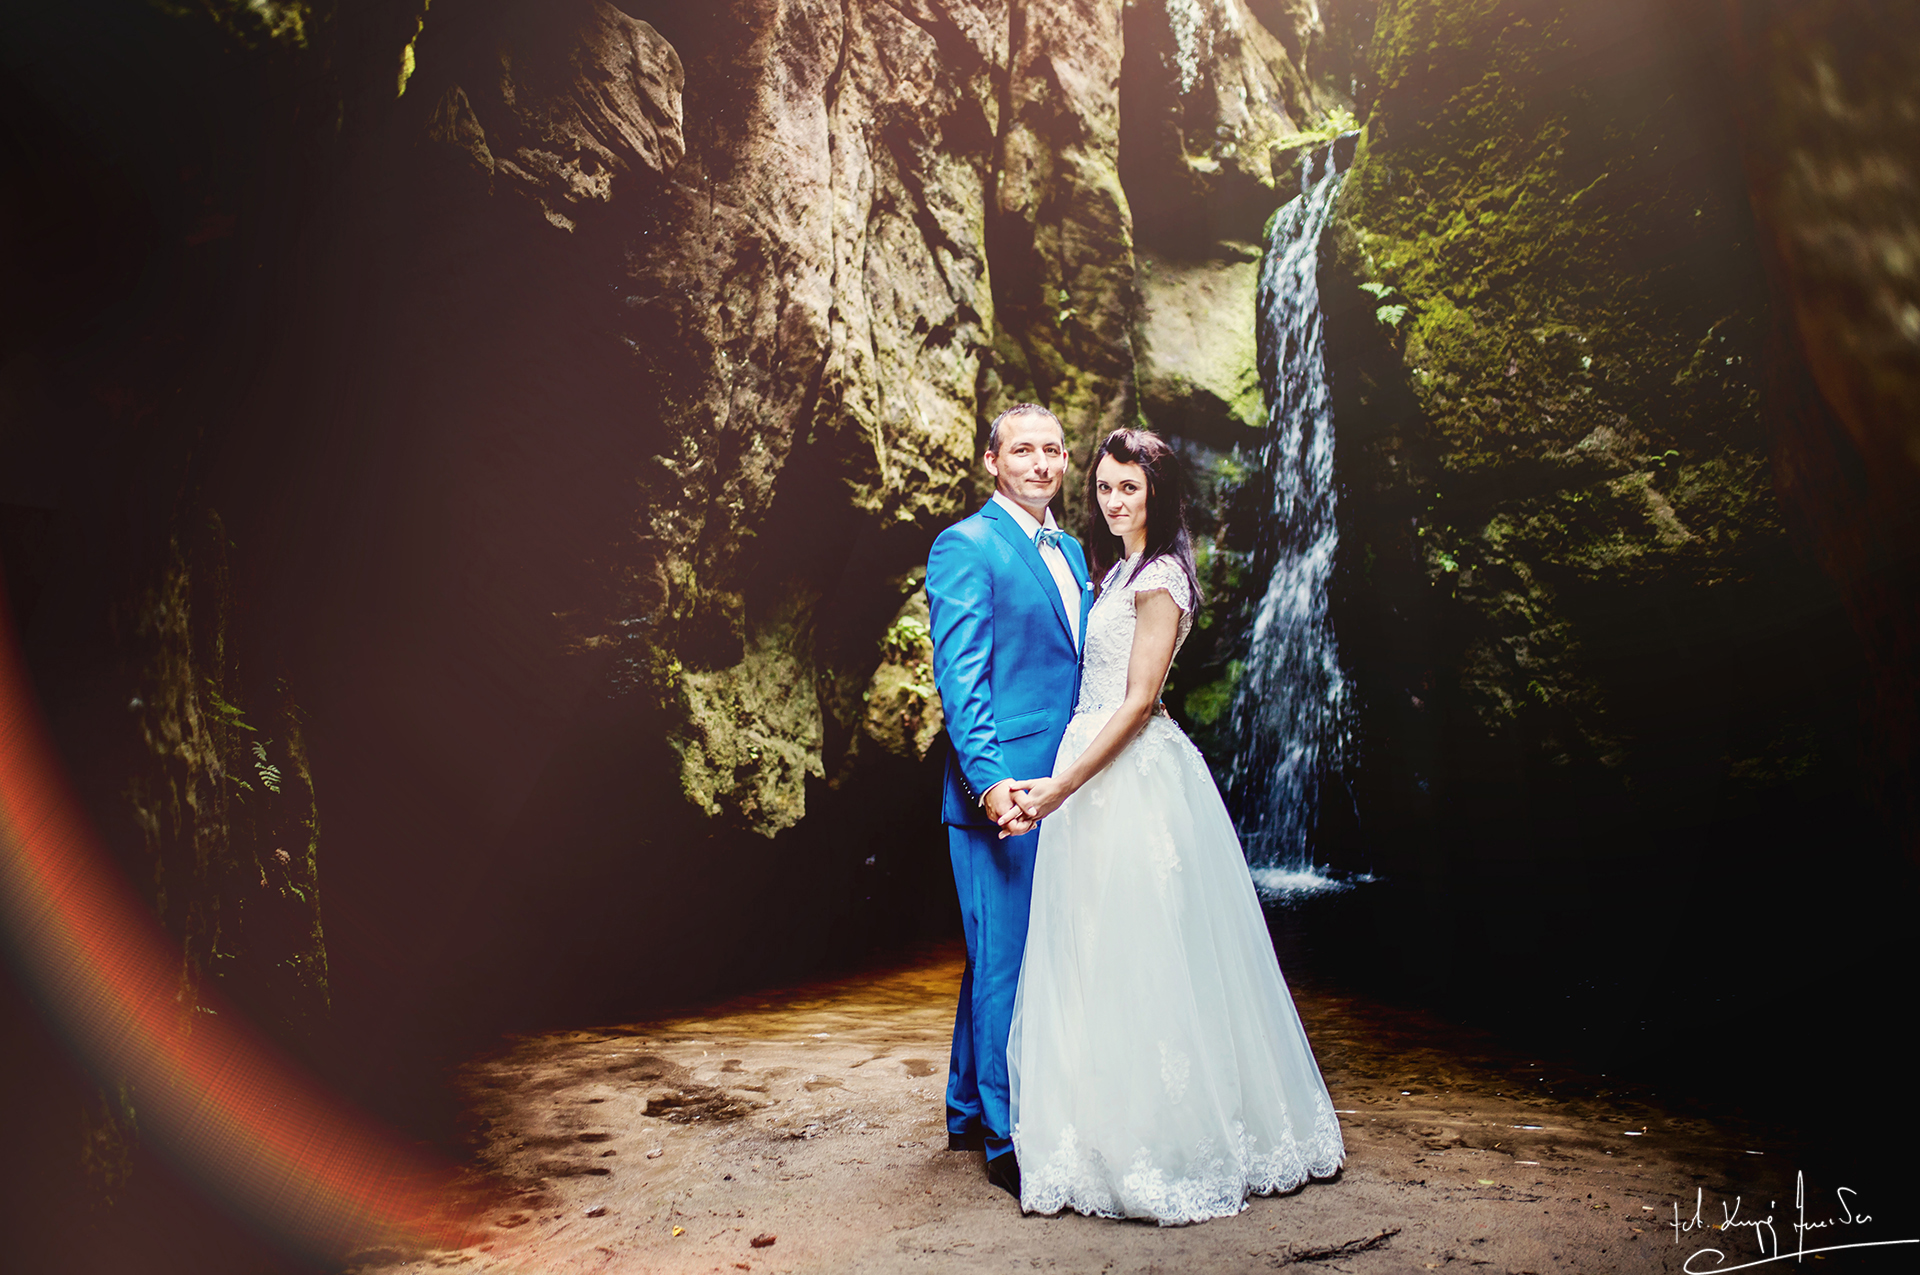 Fotograf Miastko 102 Aneta & Maciej